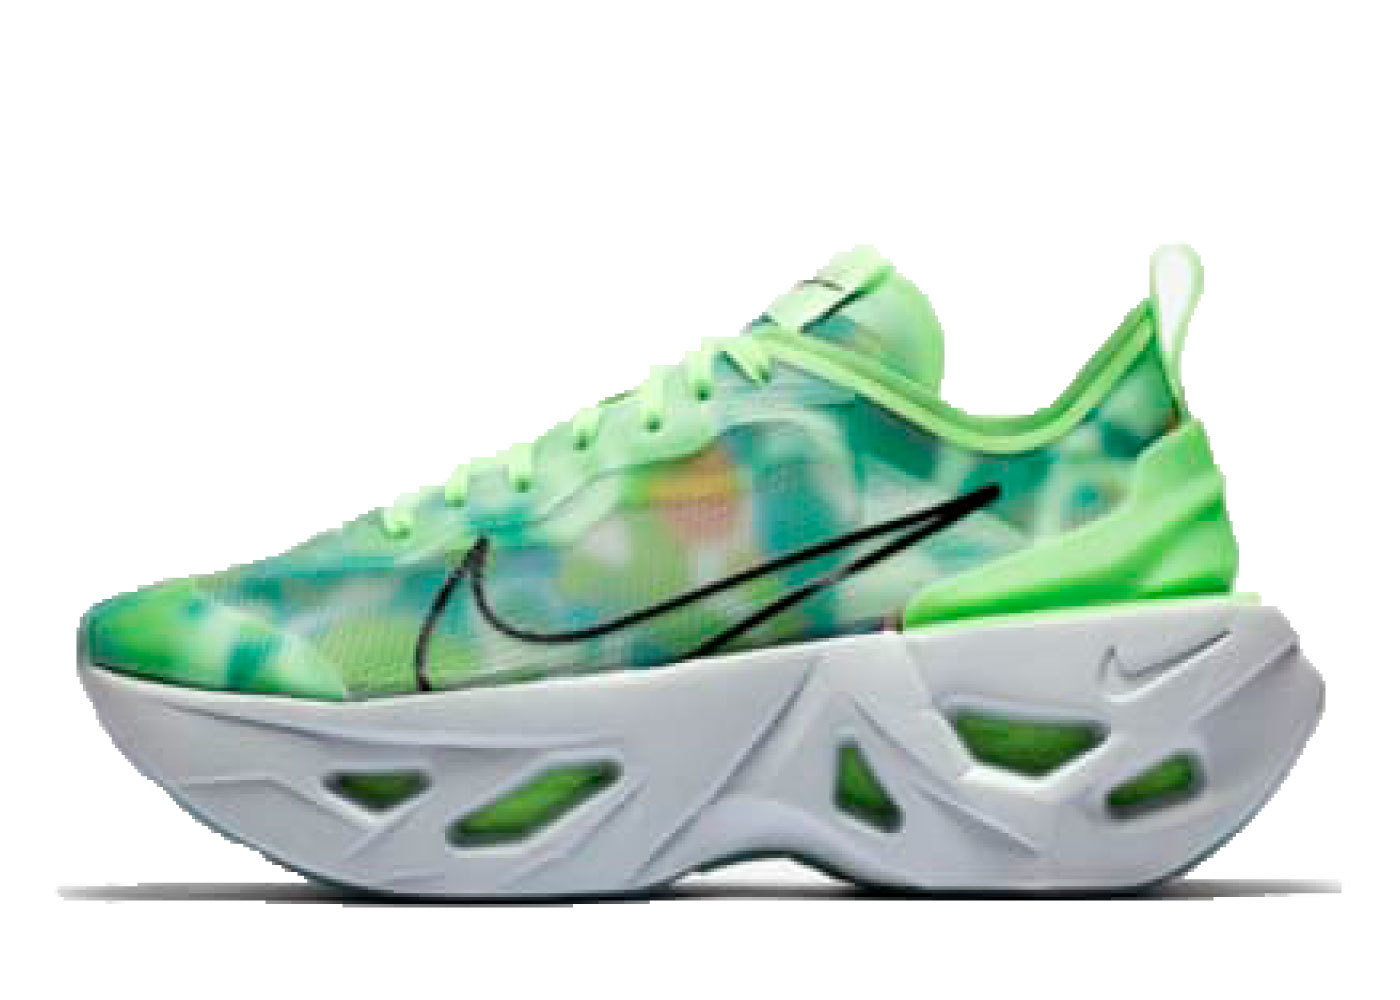 Nike Zoom X Vista Grind Lime Dye Womensの写真